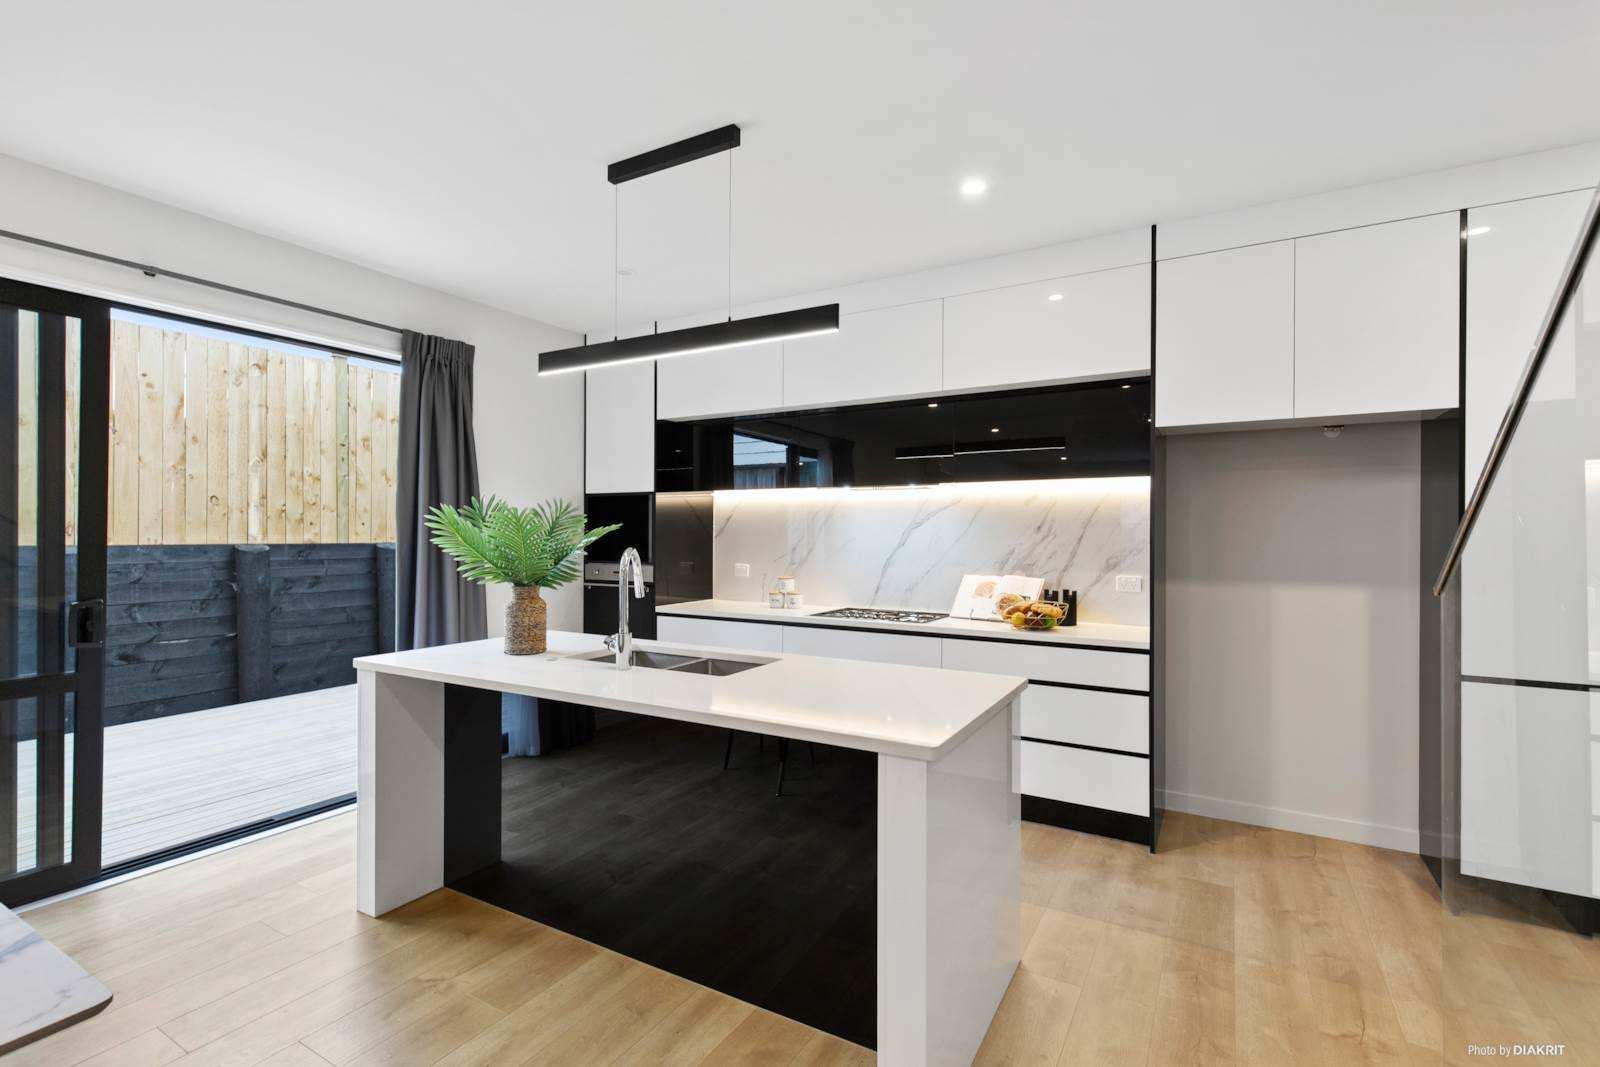 Hobsonville 4房 全新现代别墅 品质一流装潢 好校荟萃 交通便捷 即刻抵达奥克兰CBD! Brand New Living!